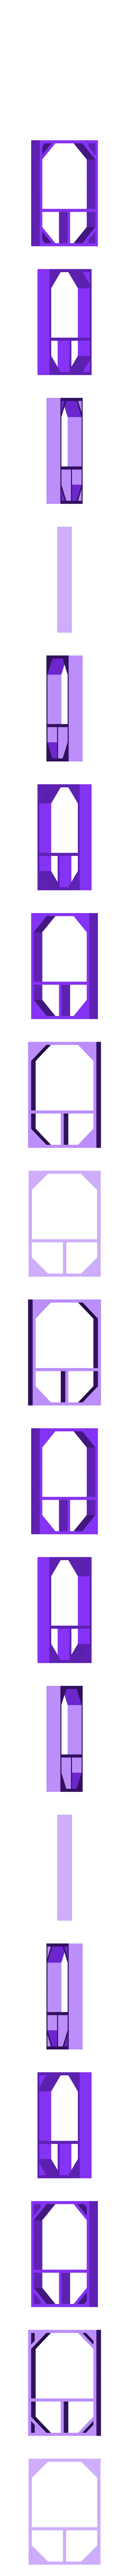 FibonacciOfficeOrgT.stl Download free STL file Fibonacci Office Organizer • 3D printer template, Duskwin